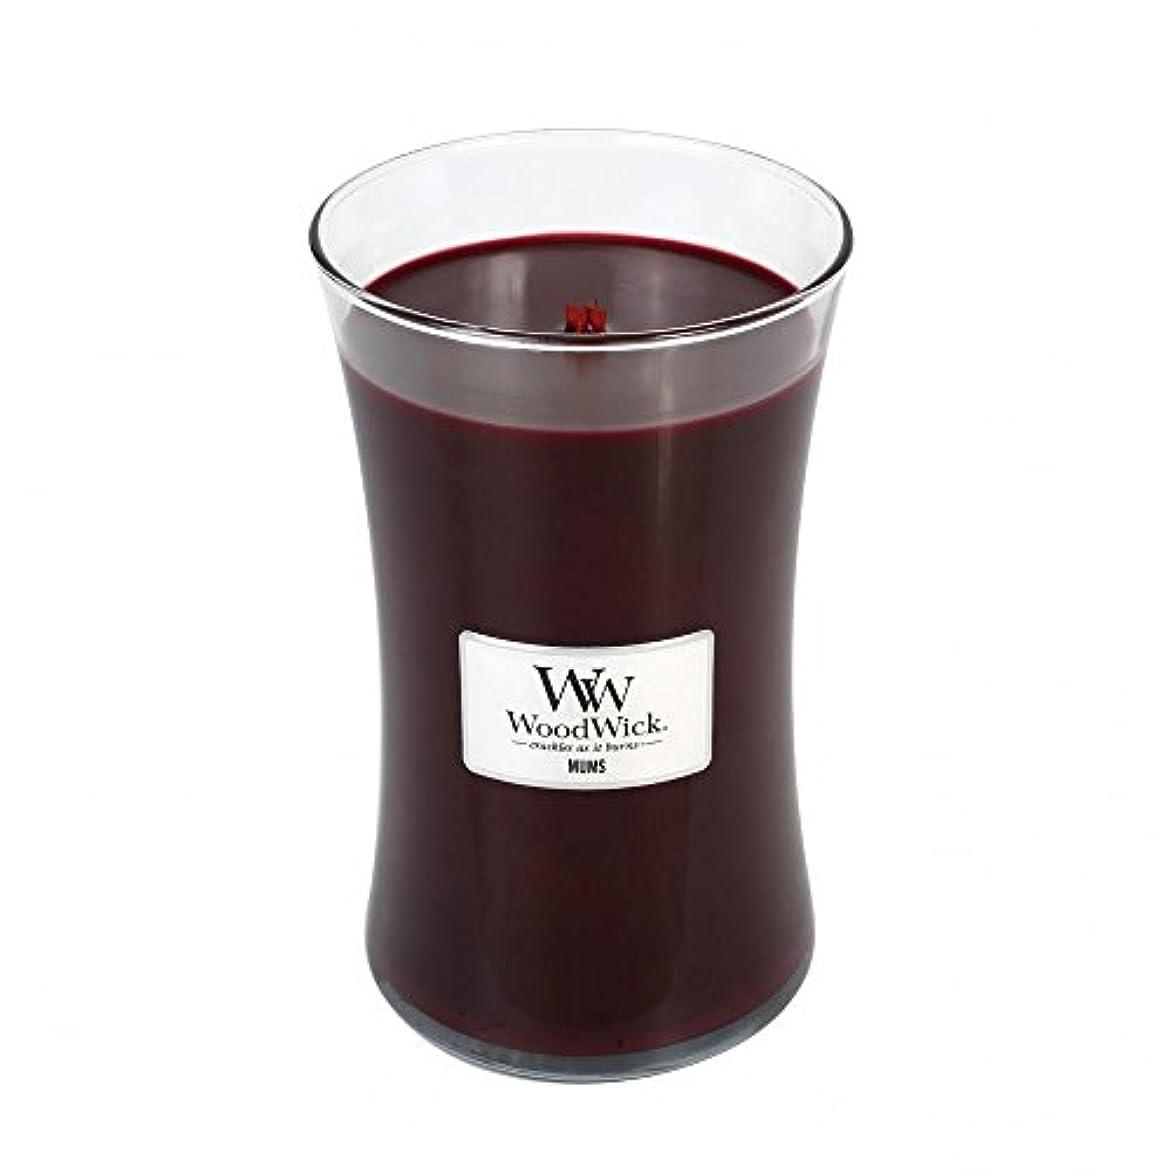 悪因子処理軍団Mums – WoodWick 22oz Large Jar Candle Burns 180時間